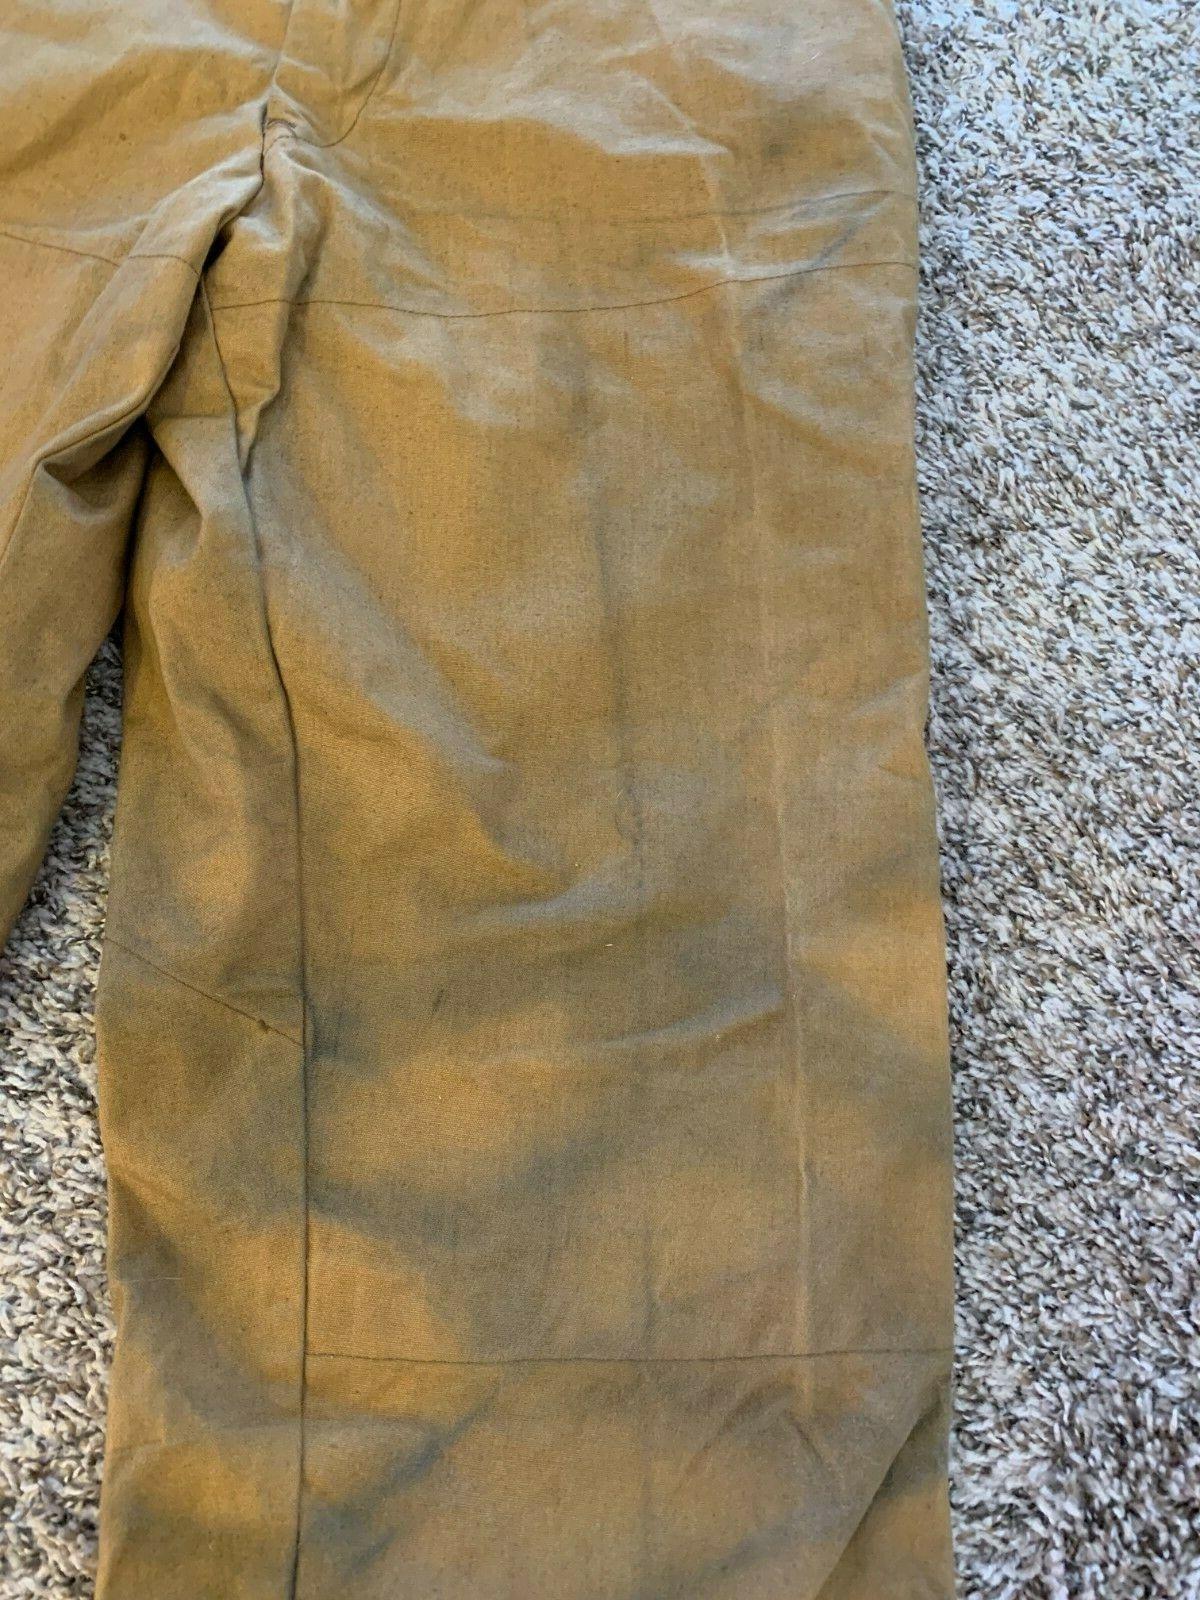 Vintage 1940's Hunting / Workwear Pants - Big Siz… - image 2